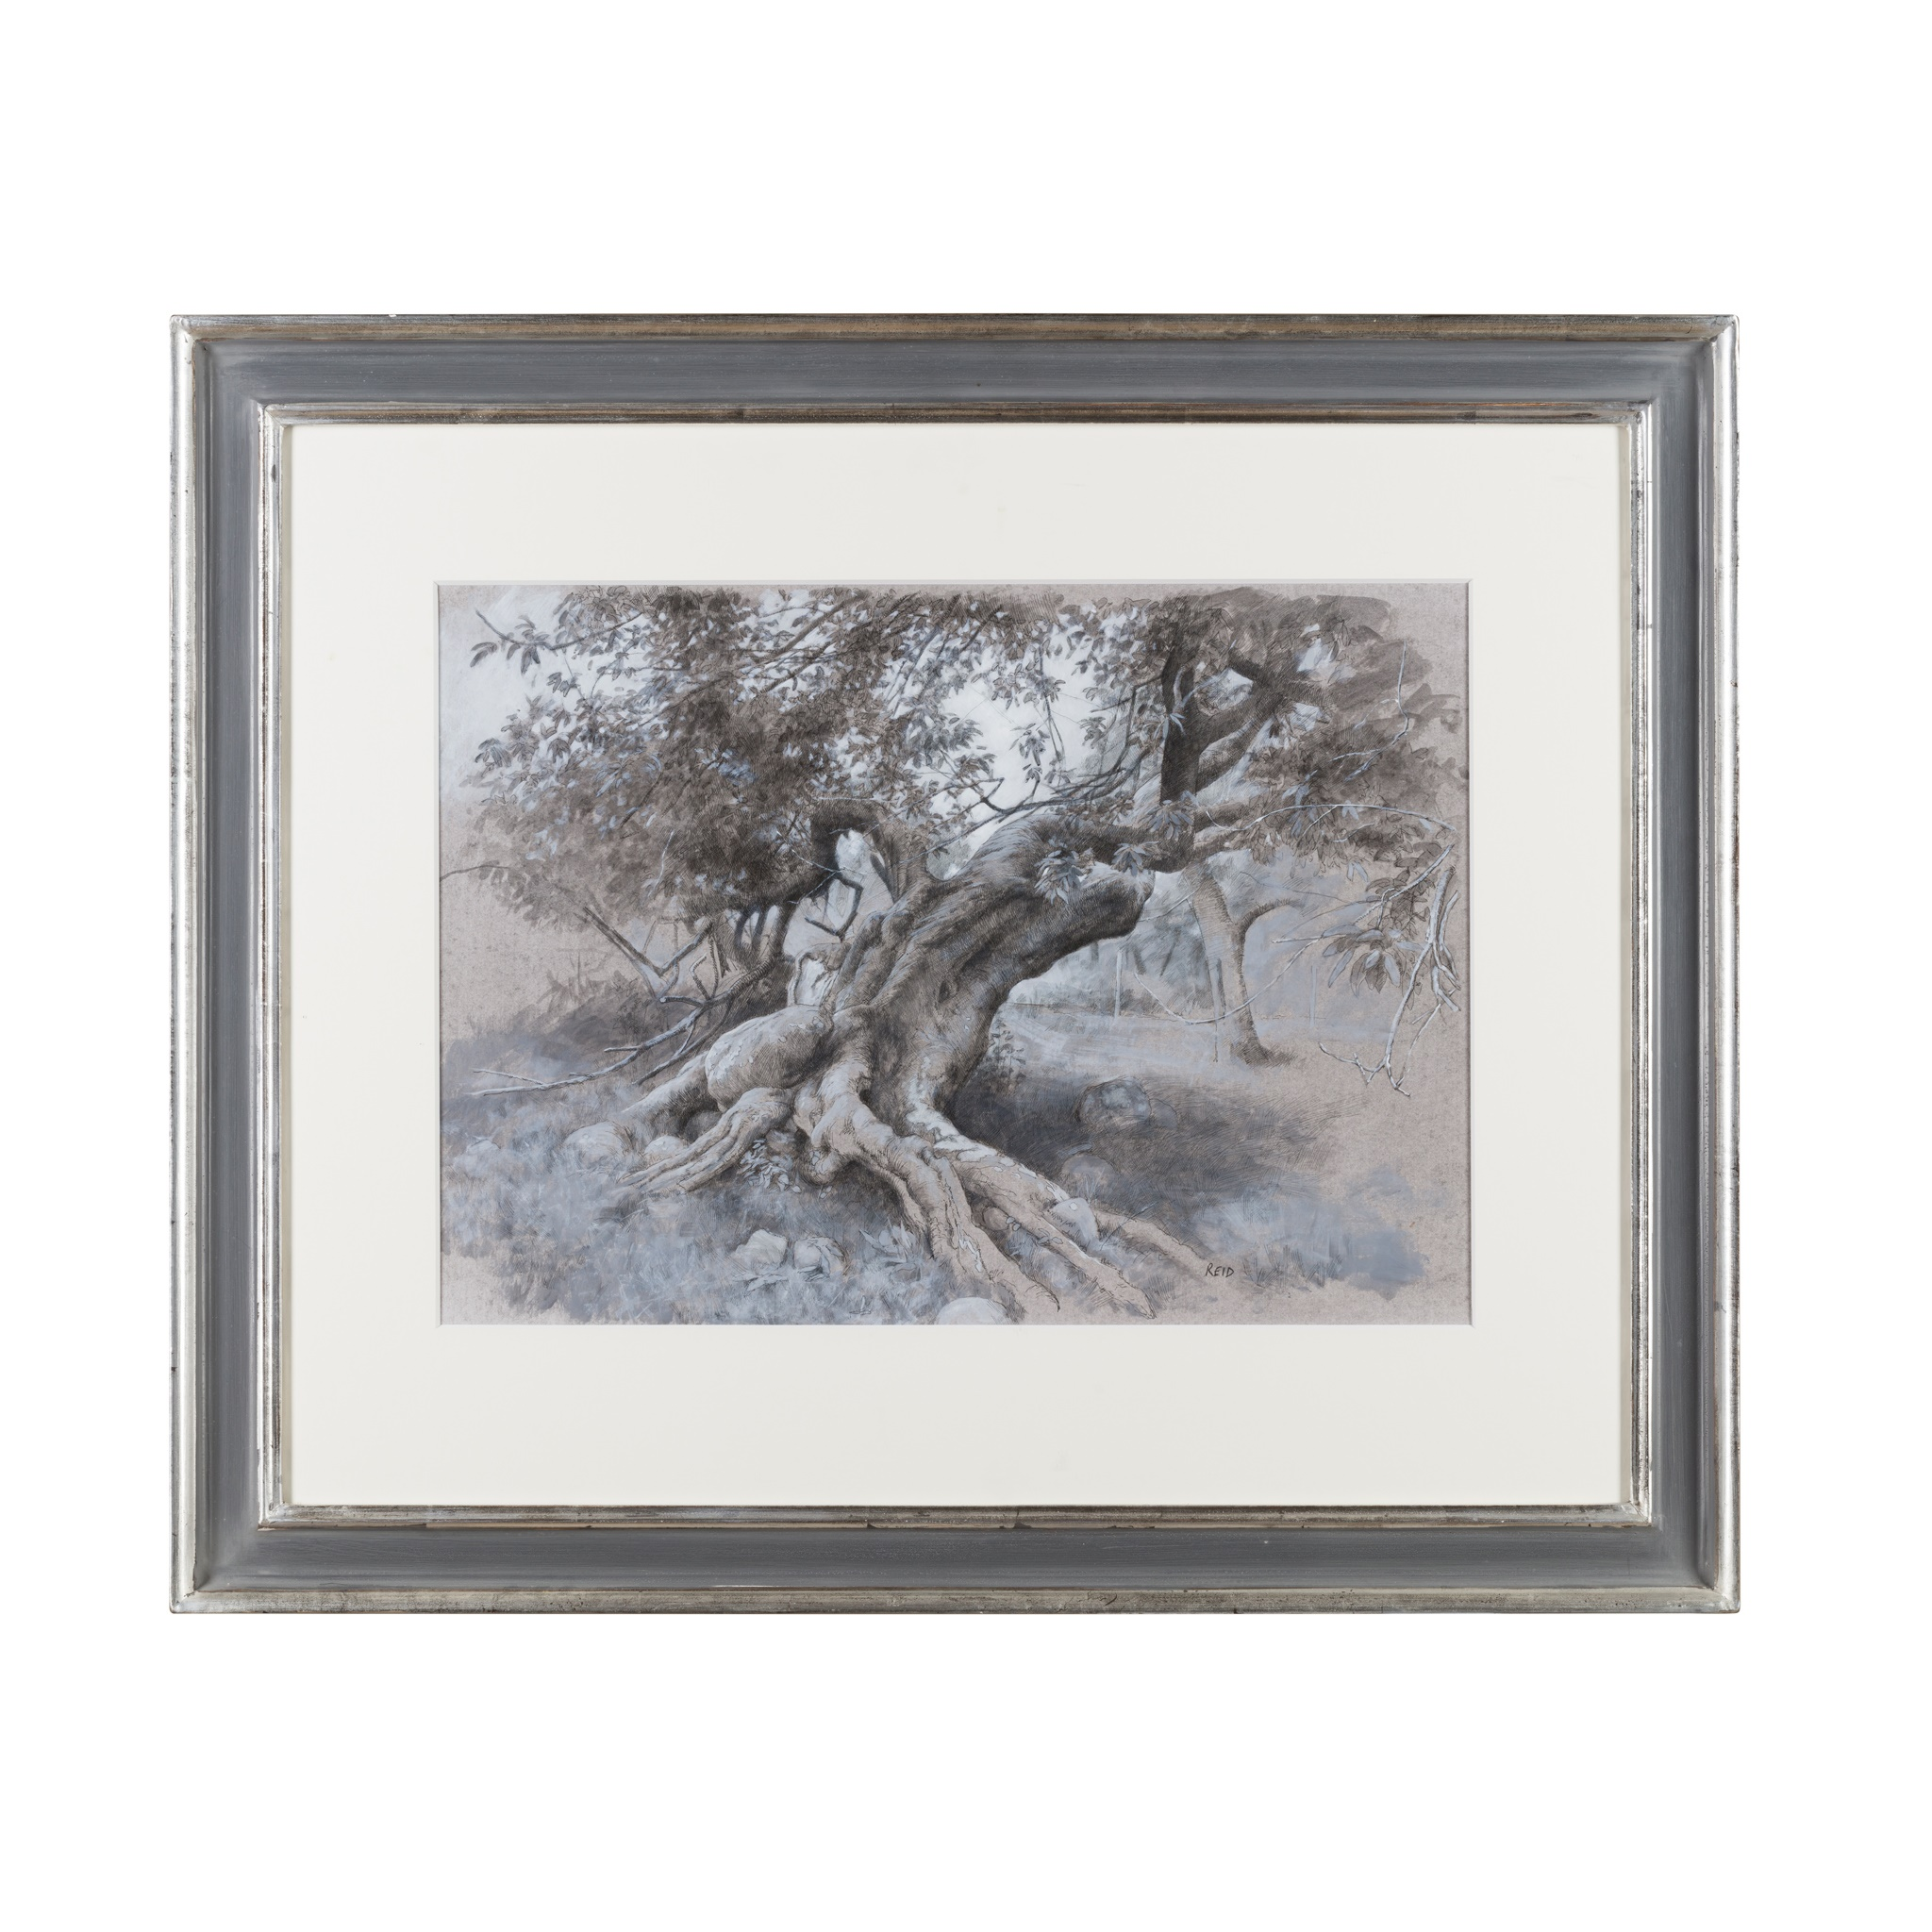 § PAUL REID (SCOTTISH B.1975) TREES - LOCH NESS - Image 2 of 3